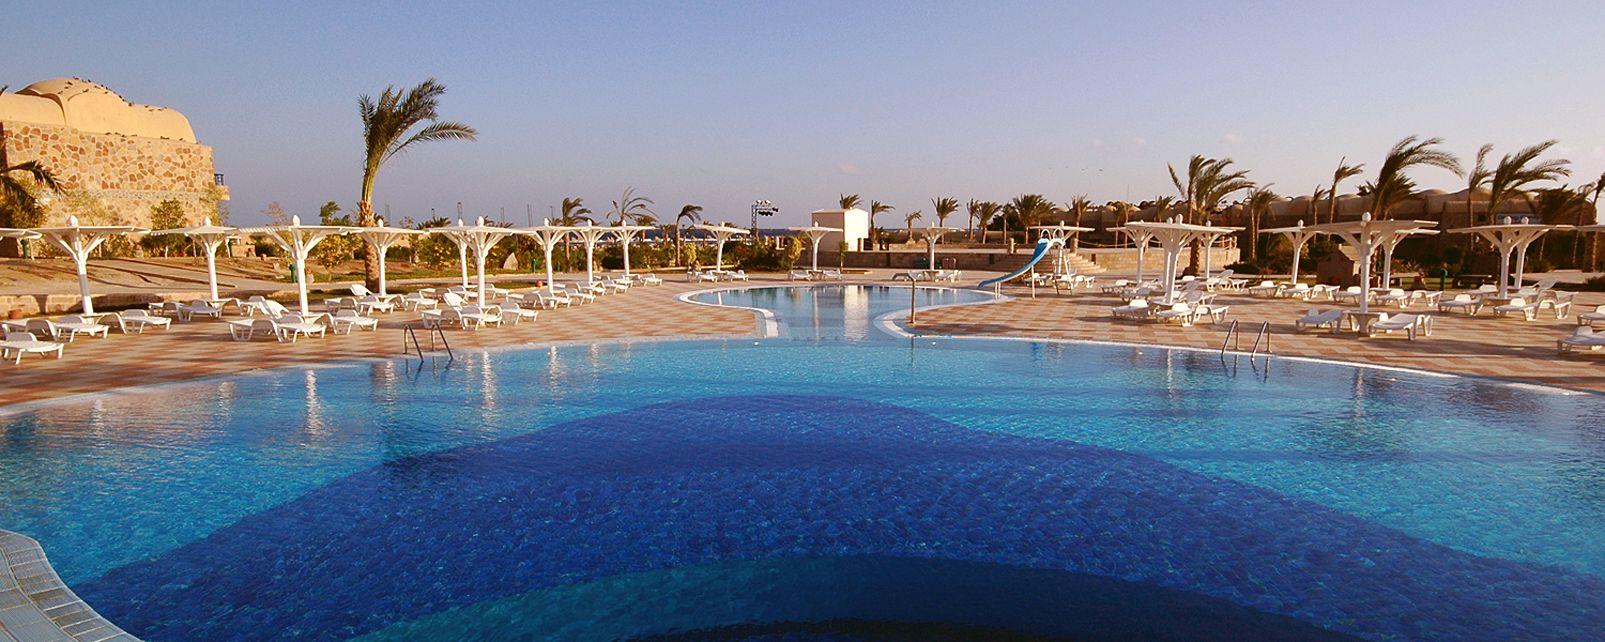 Hotel Utopia Beach